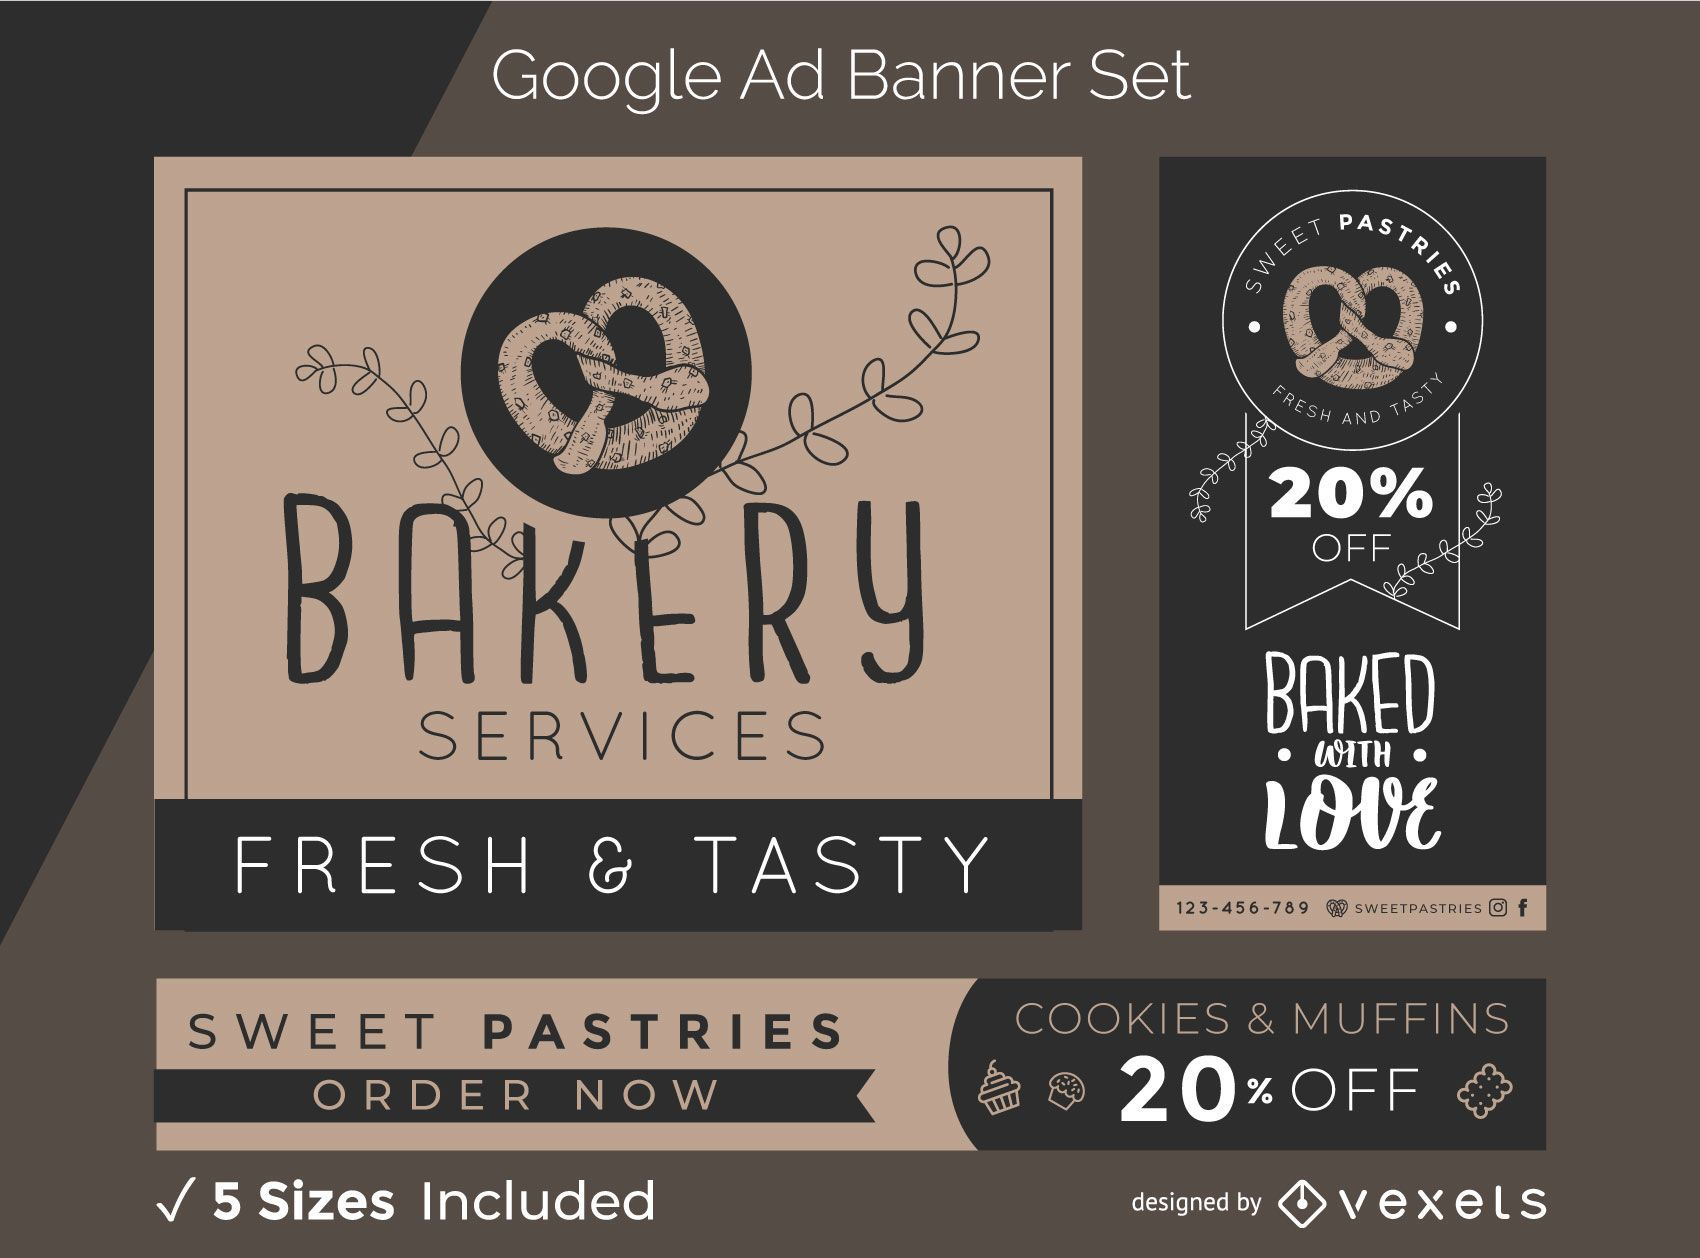 Bakery ad banner set